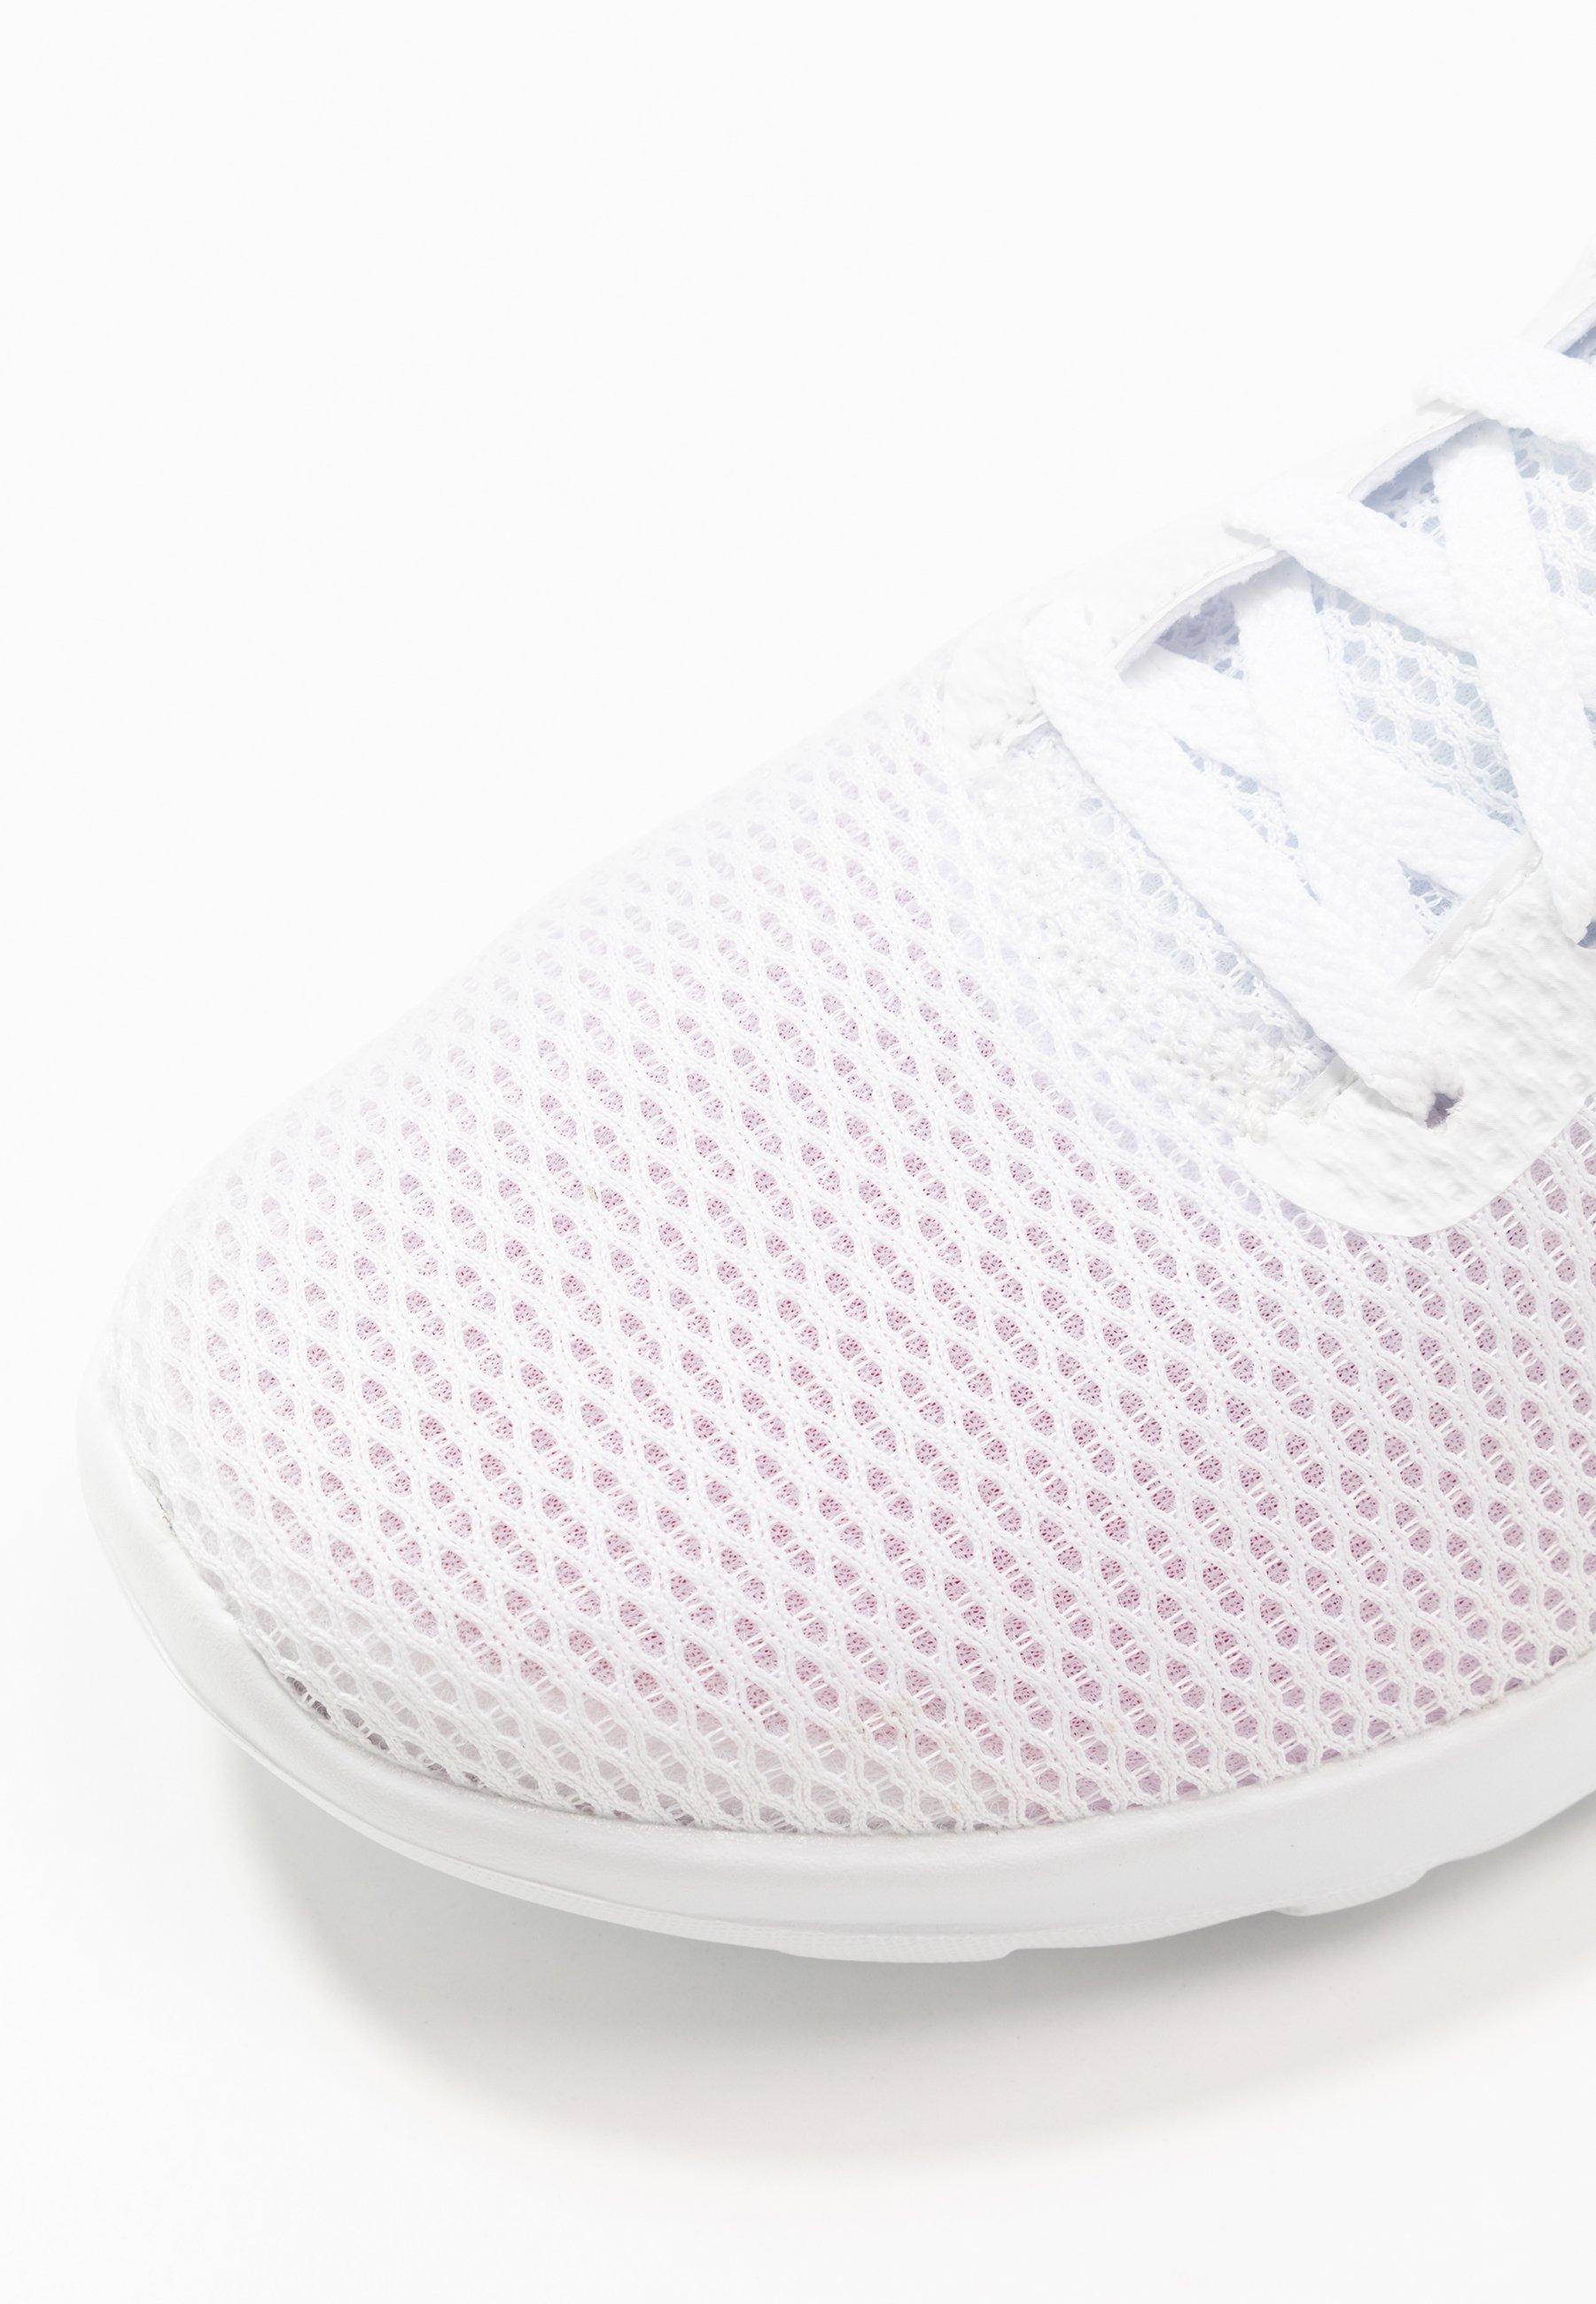 GO WALK JOY PARADISE Sportieve wandelschoenen white